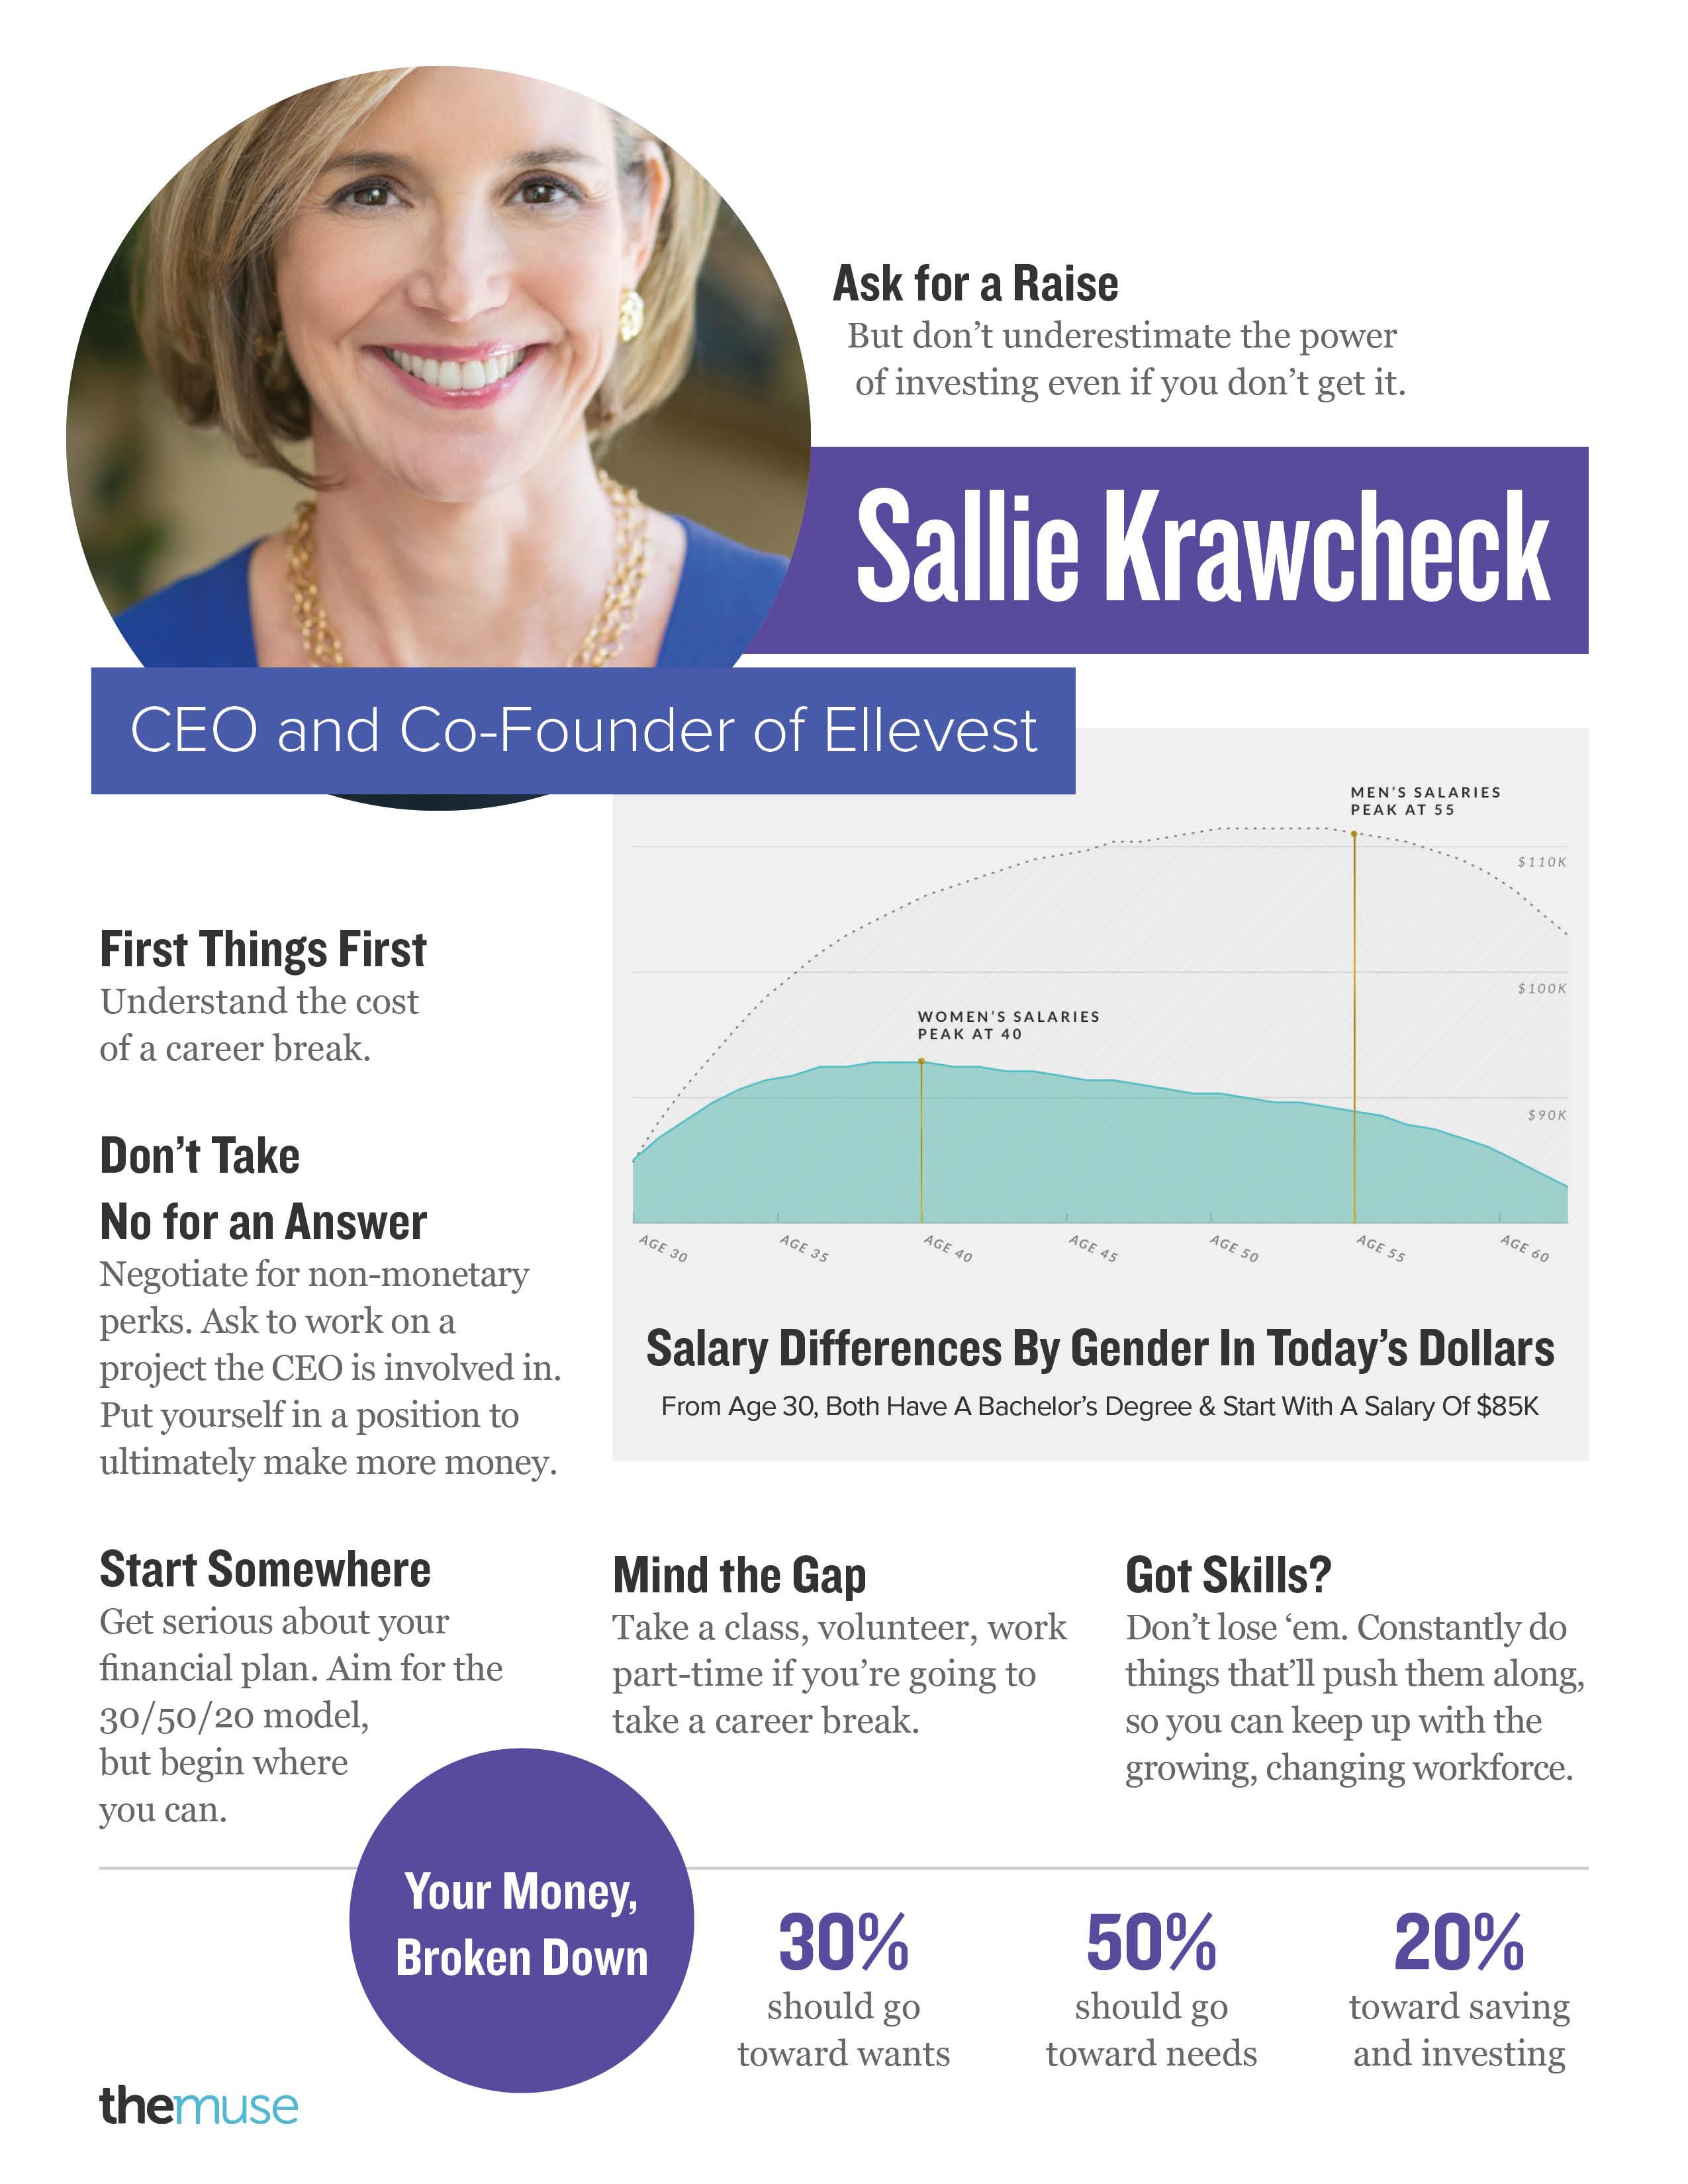 financial planning advice sallie krawckeck the muse photo courtesy sallie krawcheck